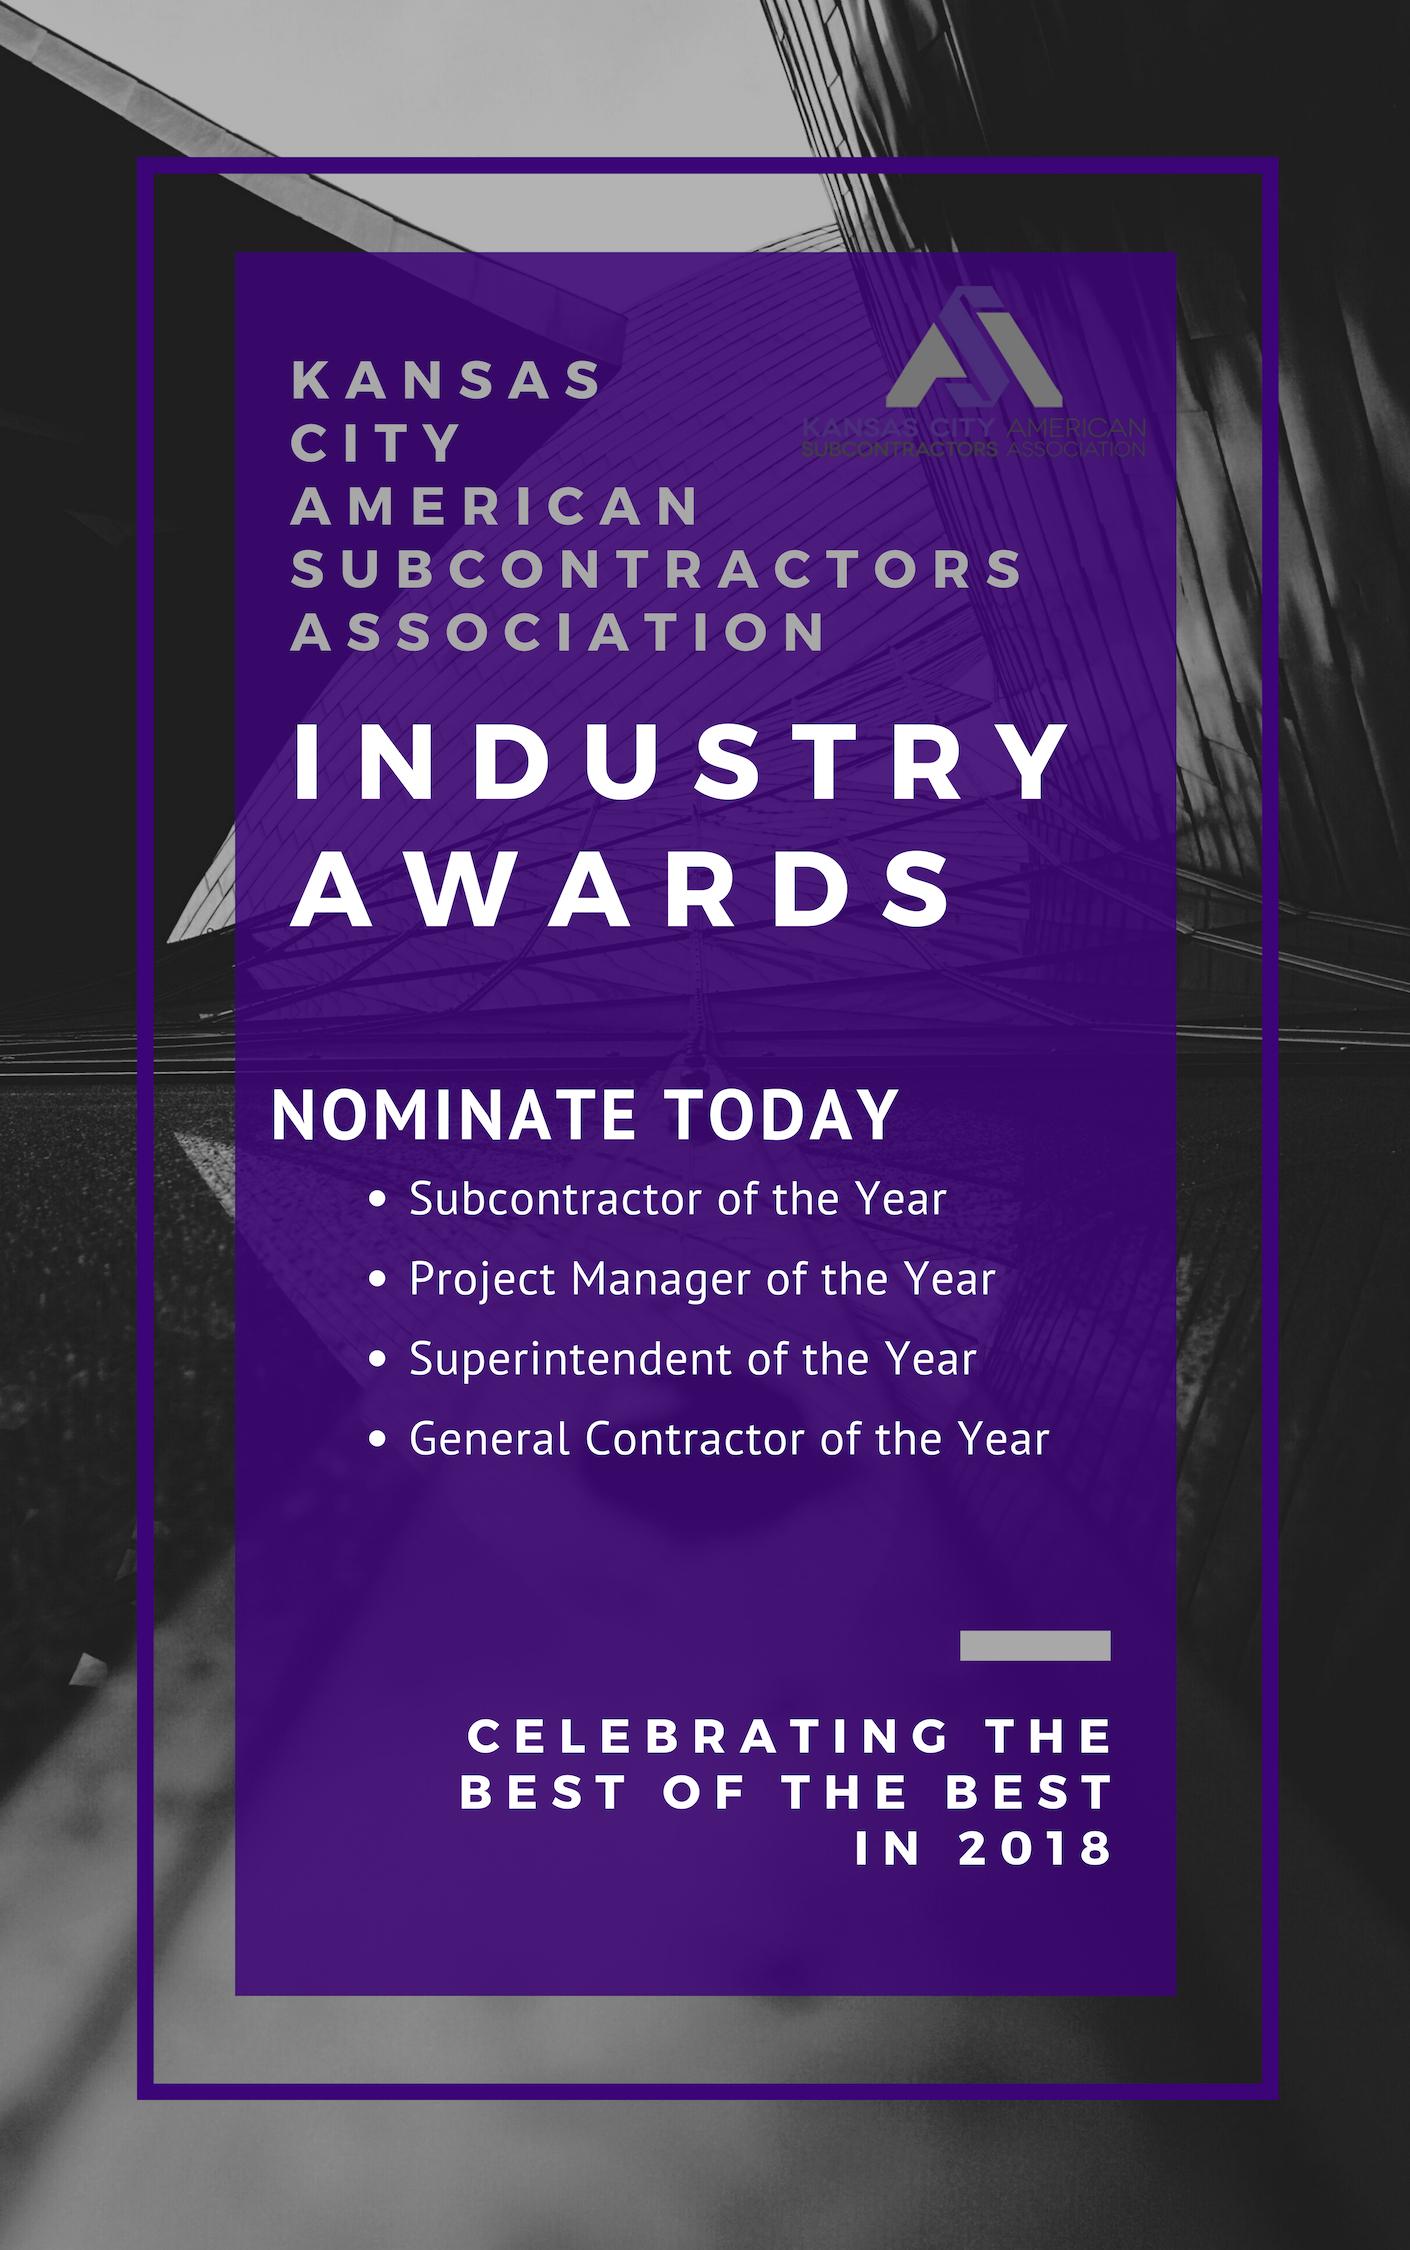 KansasCityAmericanSubcontractors Association.jpg